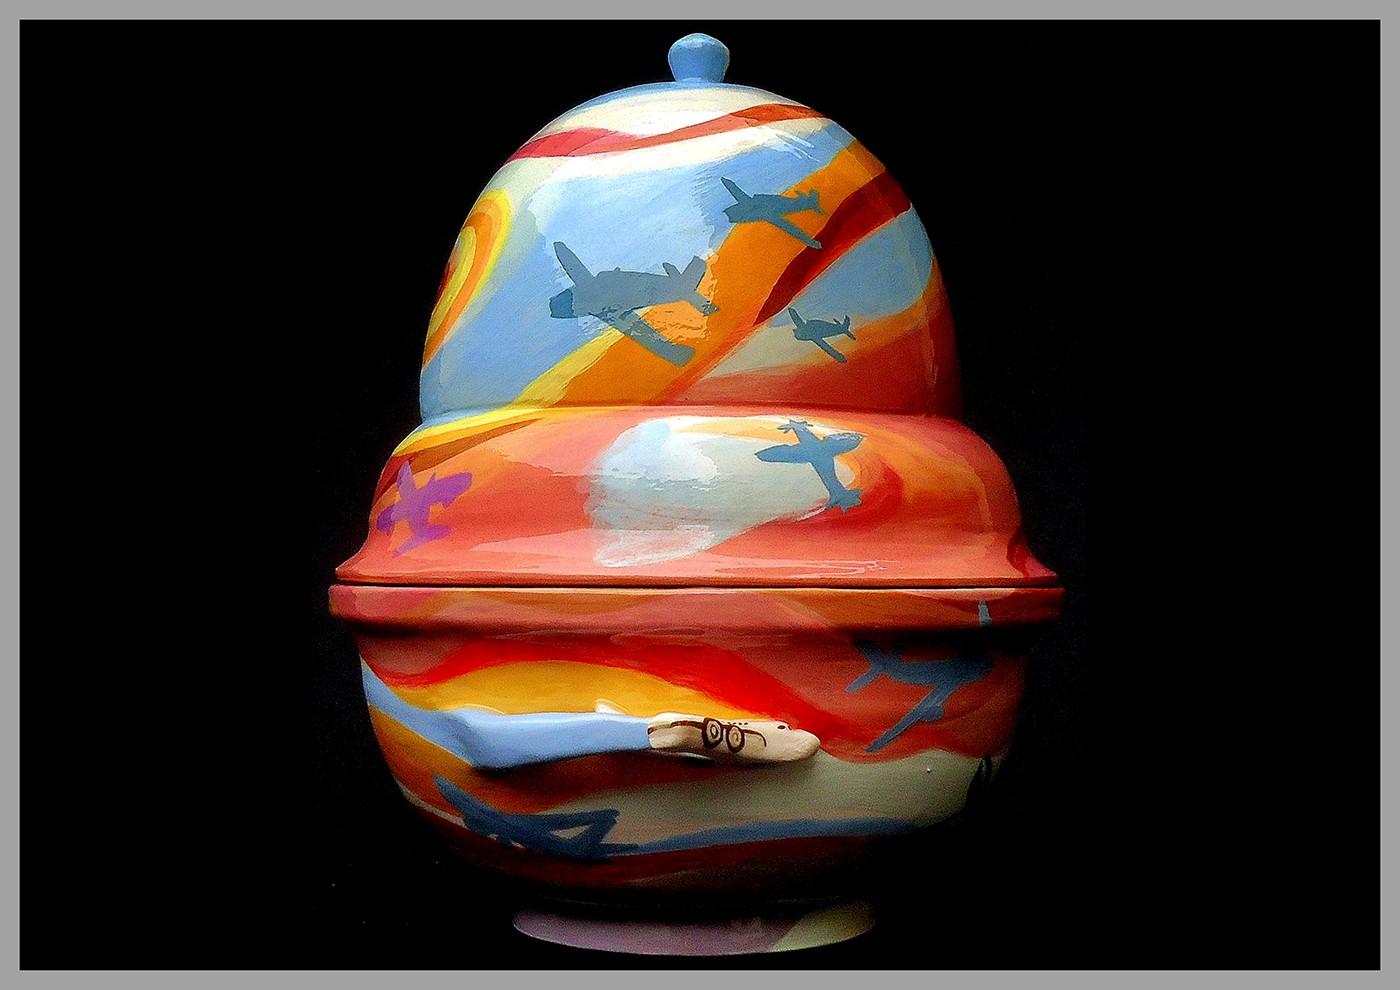 Aeronaut's Tableware by David Gomez